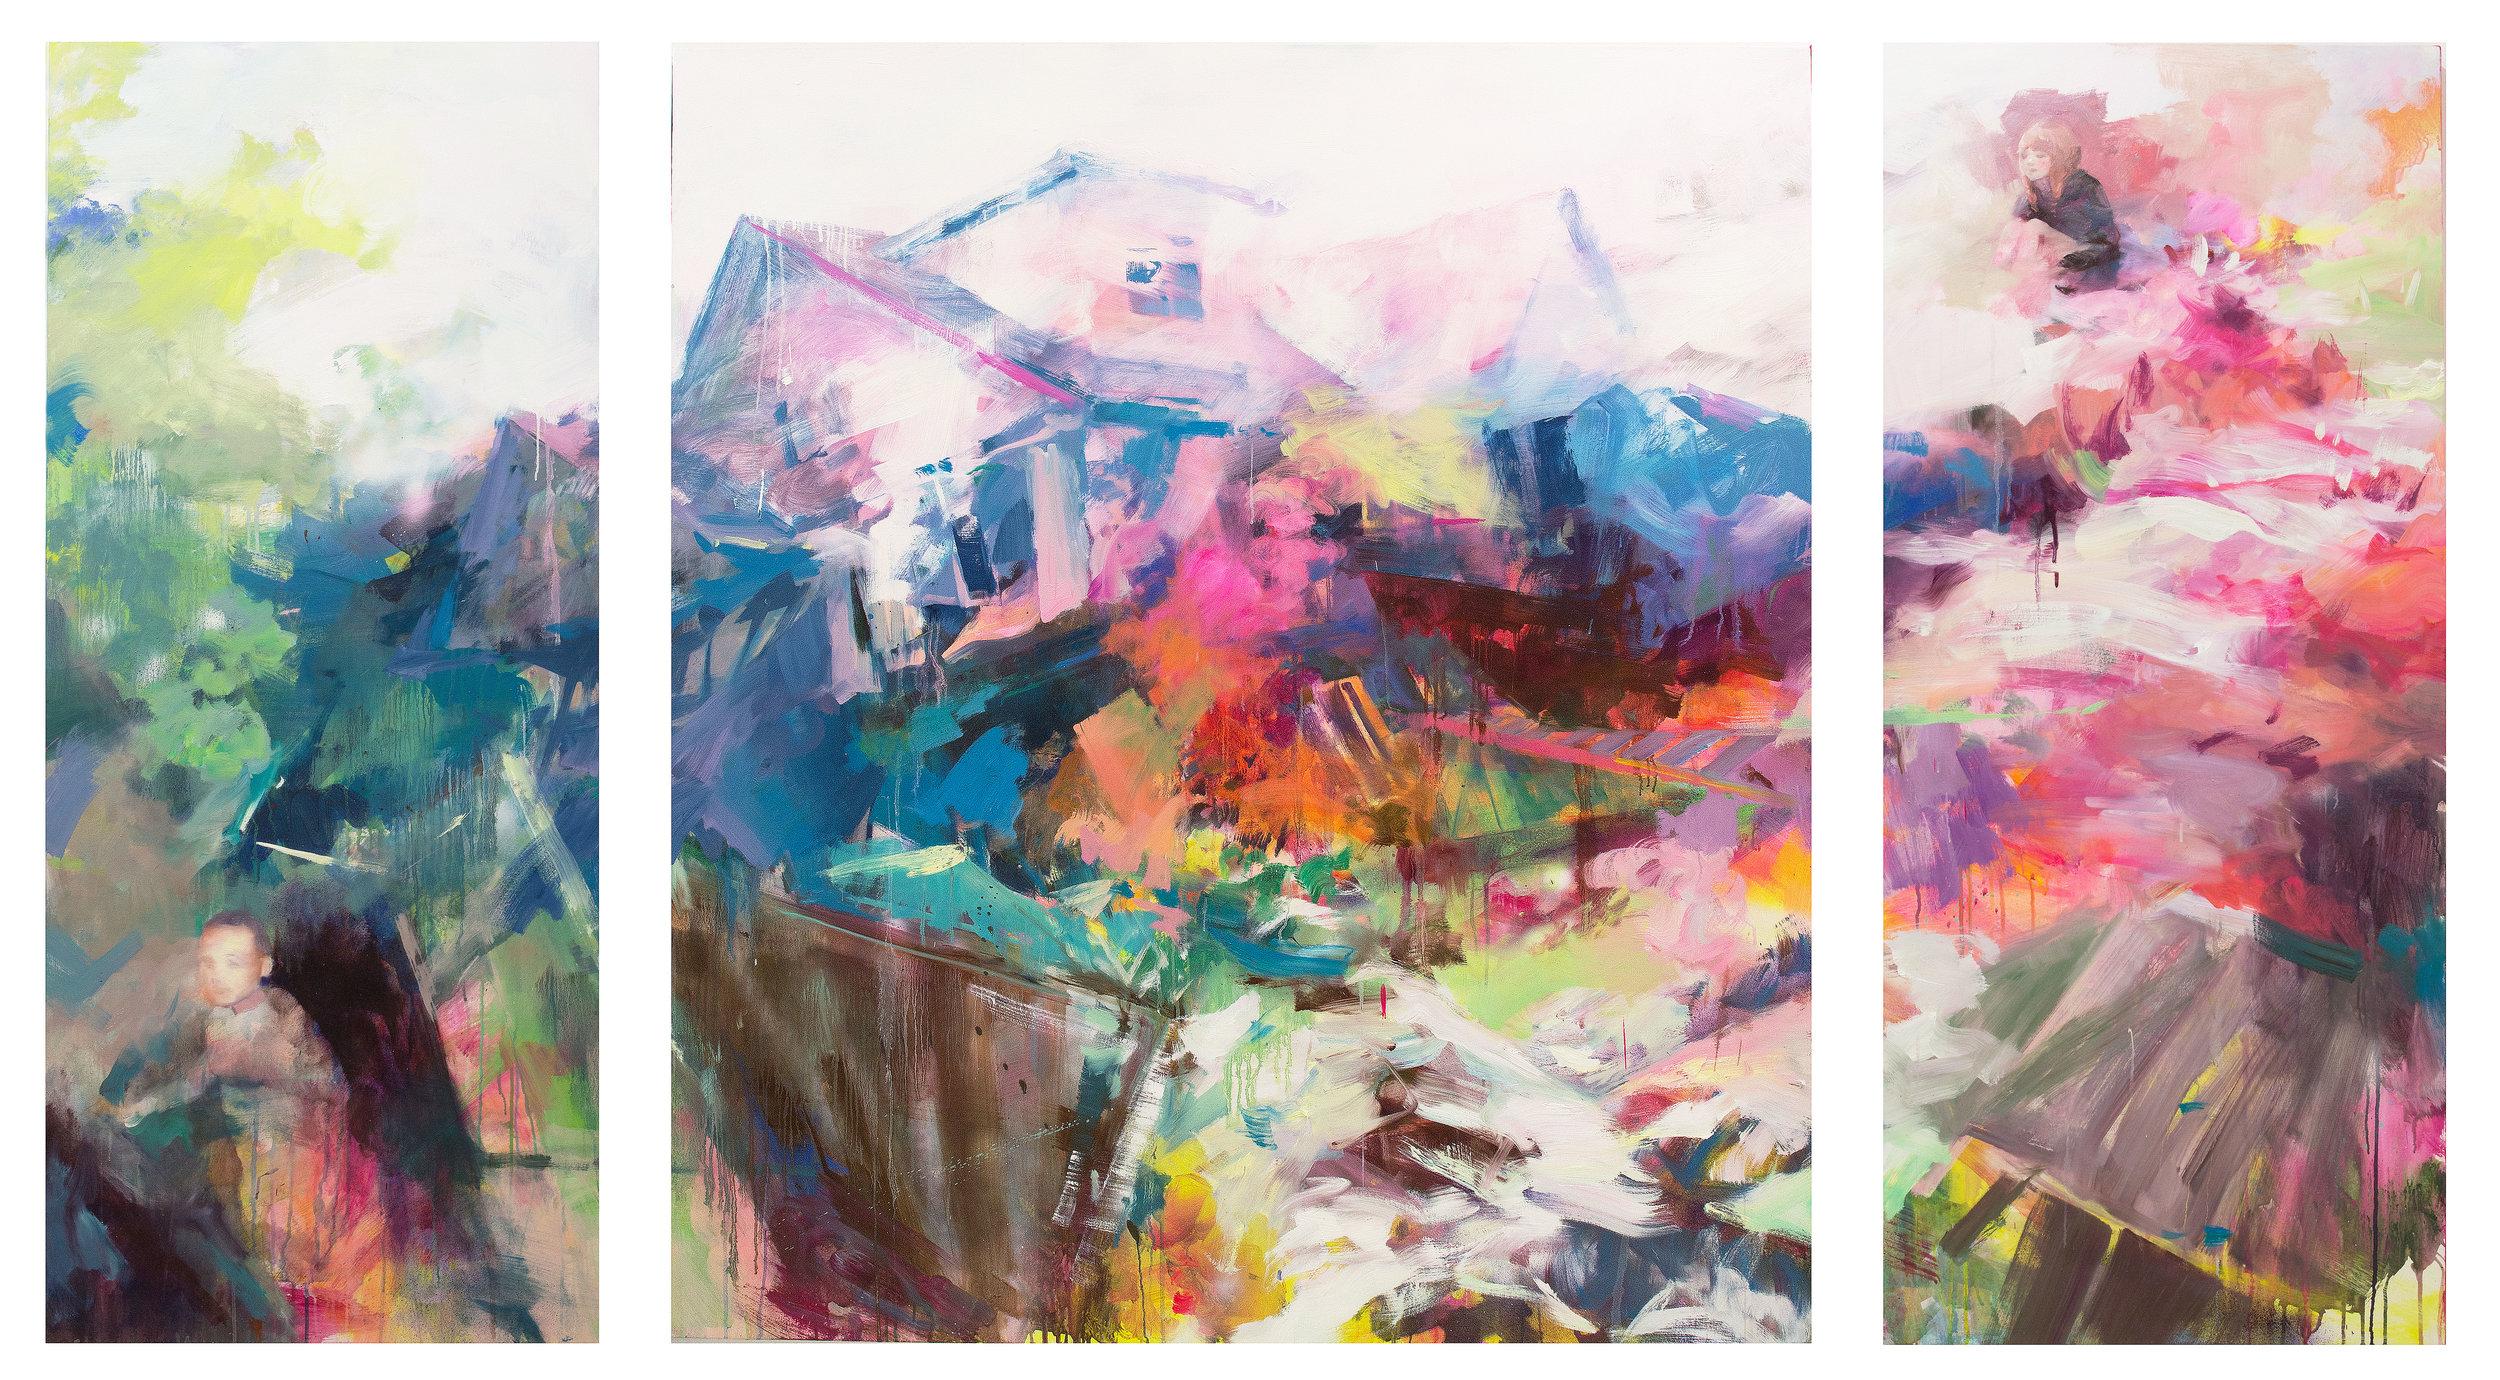 Candy House   triptych 180x75  180x180  180x75  2015 oil on canvas.jpg